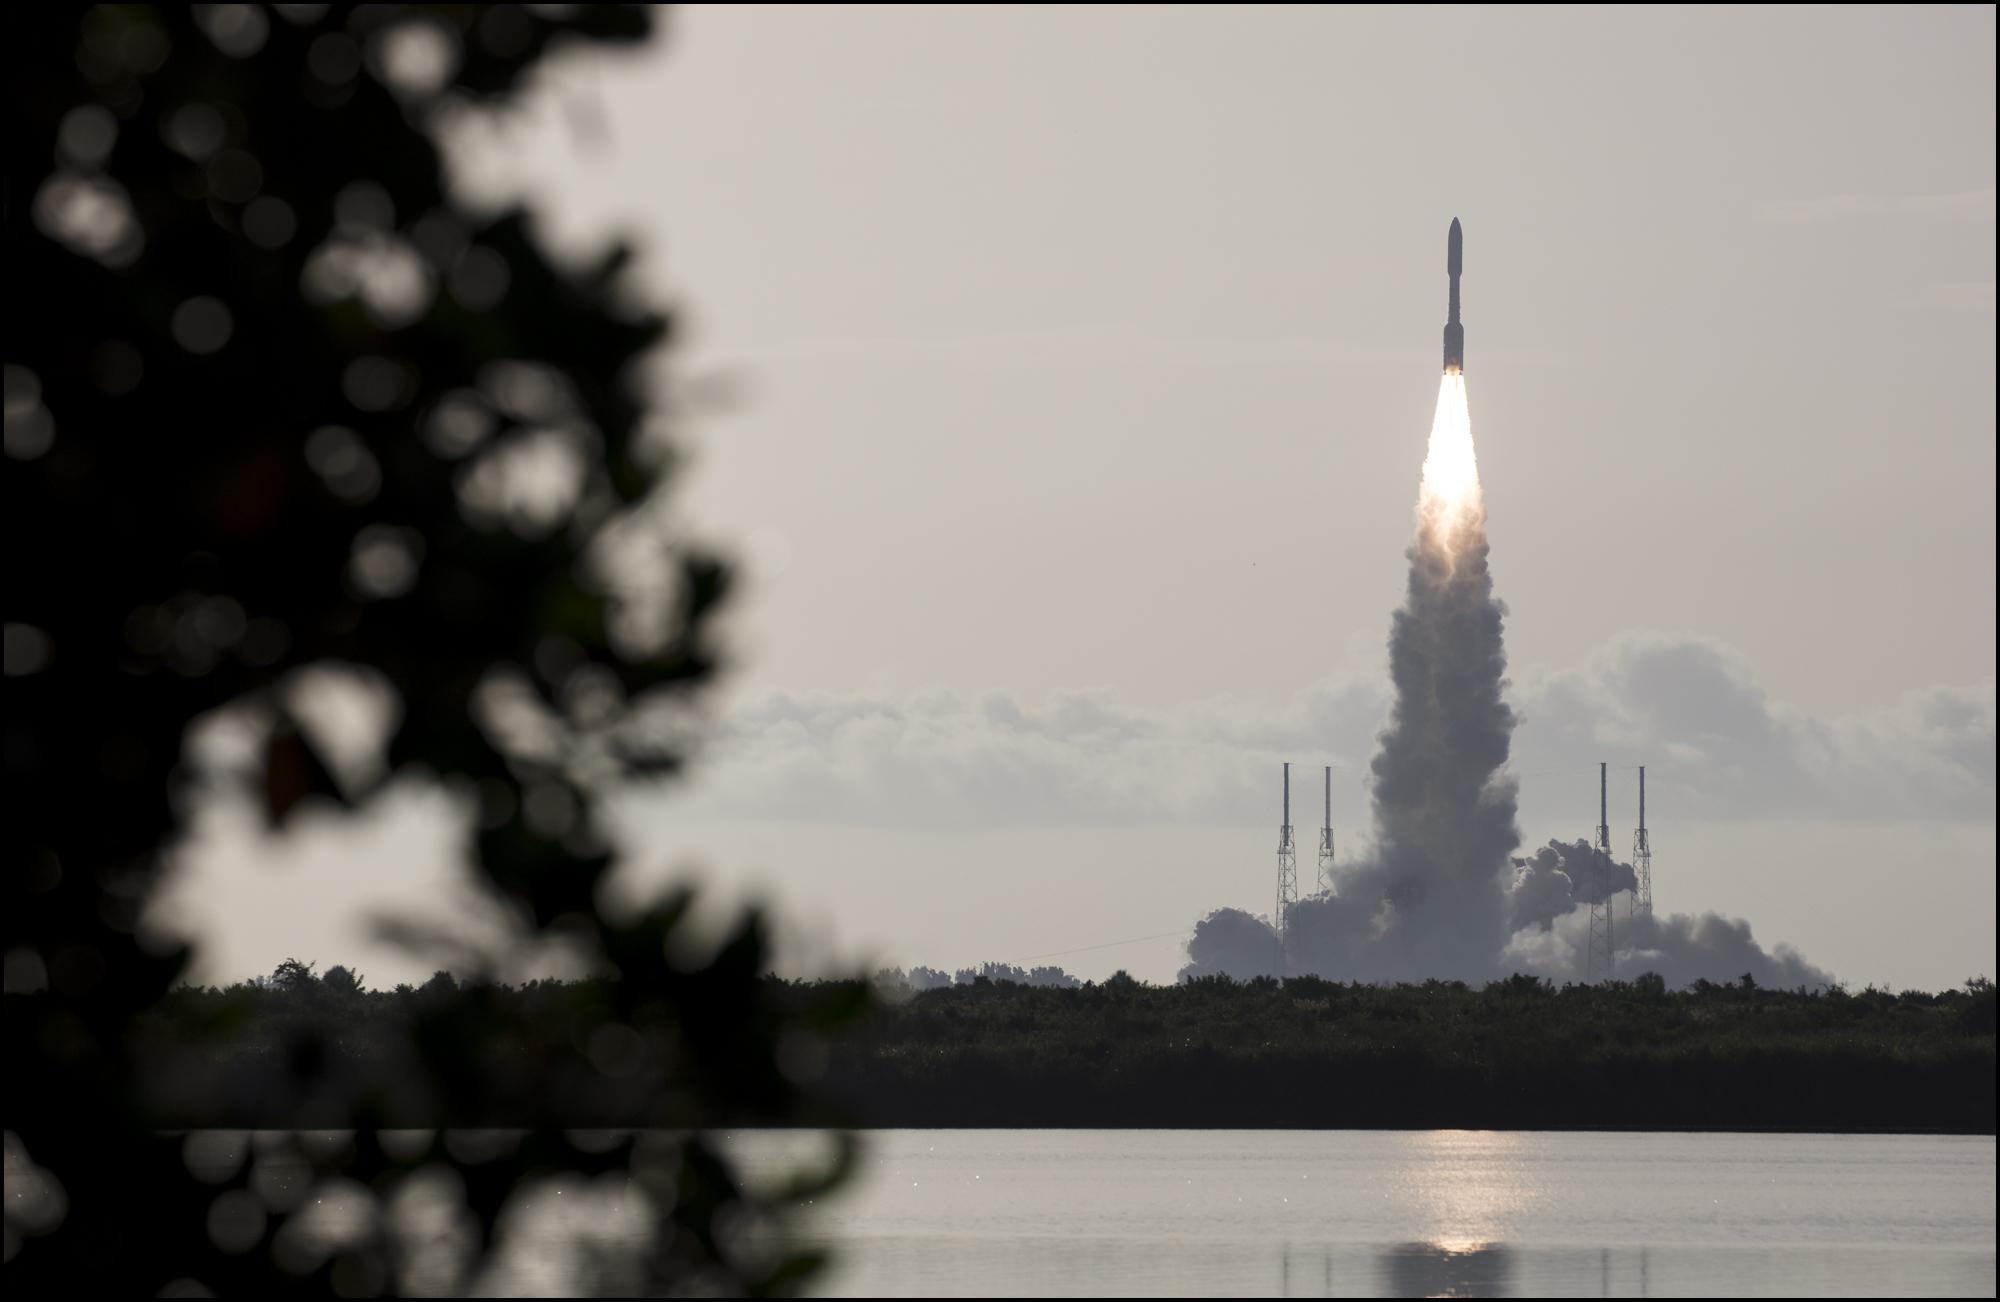 Атлас 5 с марсоходом стартовал с Канаверала/фото НАСА